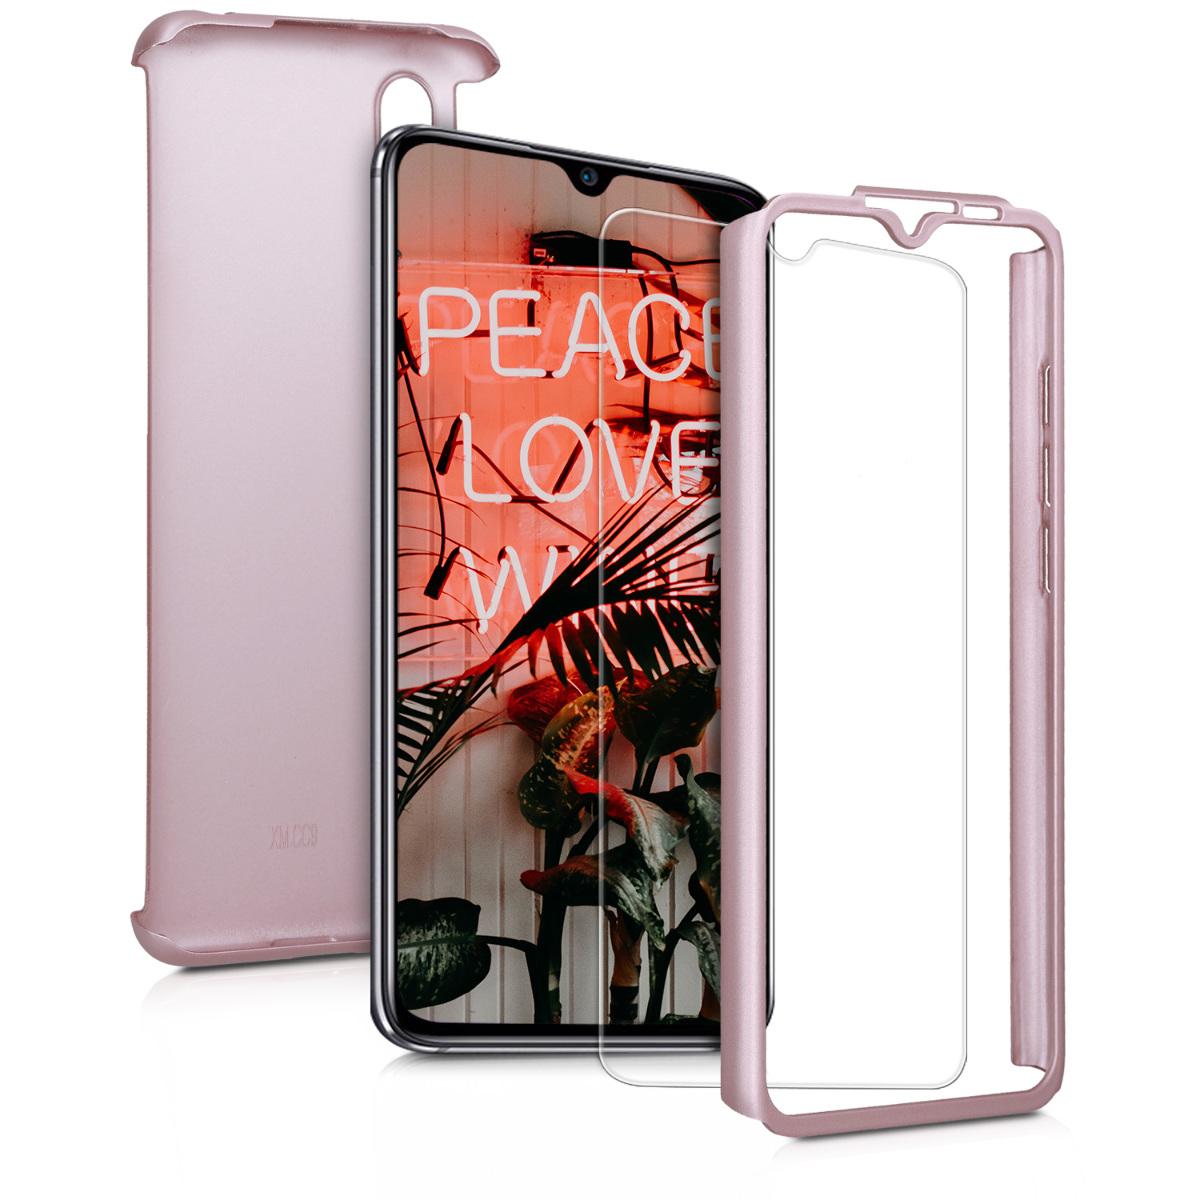 KW Full Body Θήκη Xiaomi Mi 9 Lite & Tempered Glass - Metallic Rose Gold (50586.31)